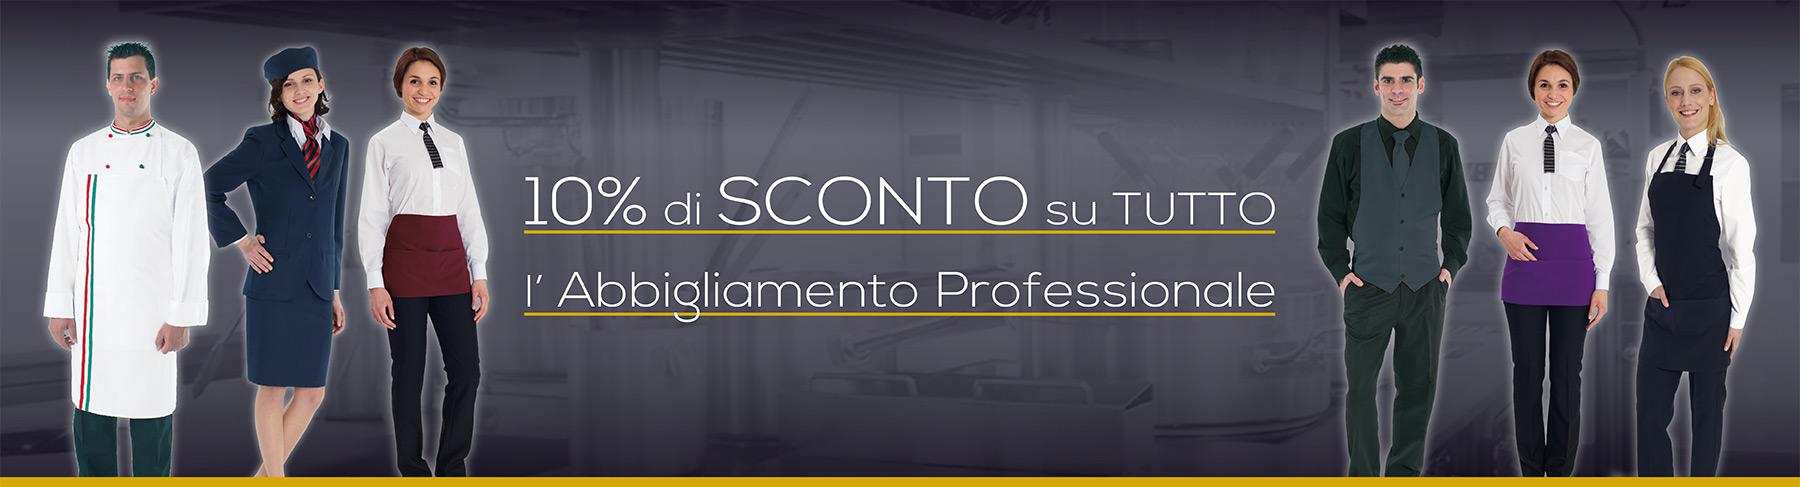 slide1_sconto_10